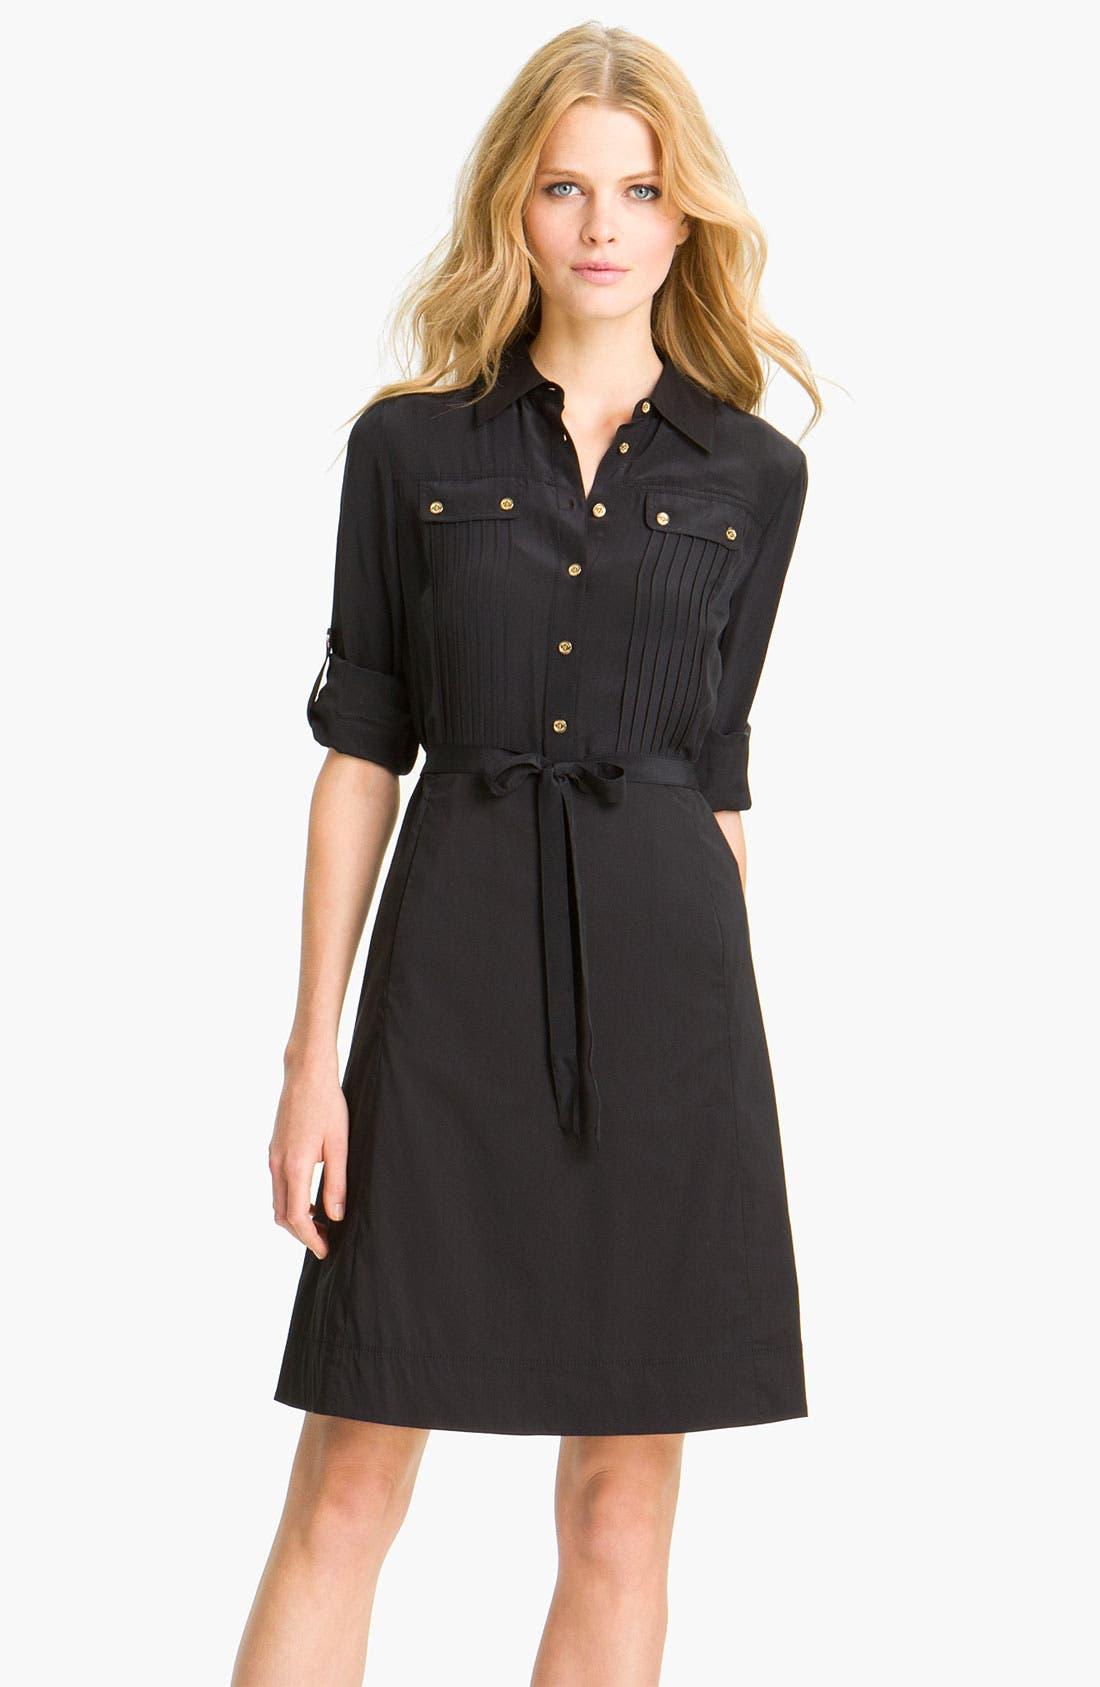 Alternate Image 1 Selected - Tory Burch 'Emmanuelle' Shirtdress